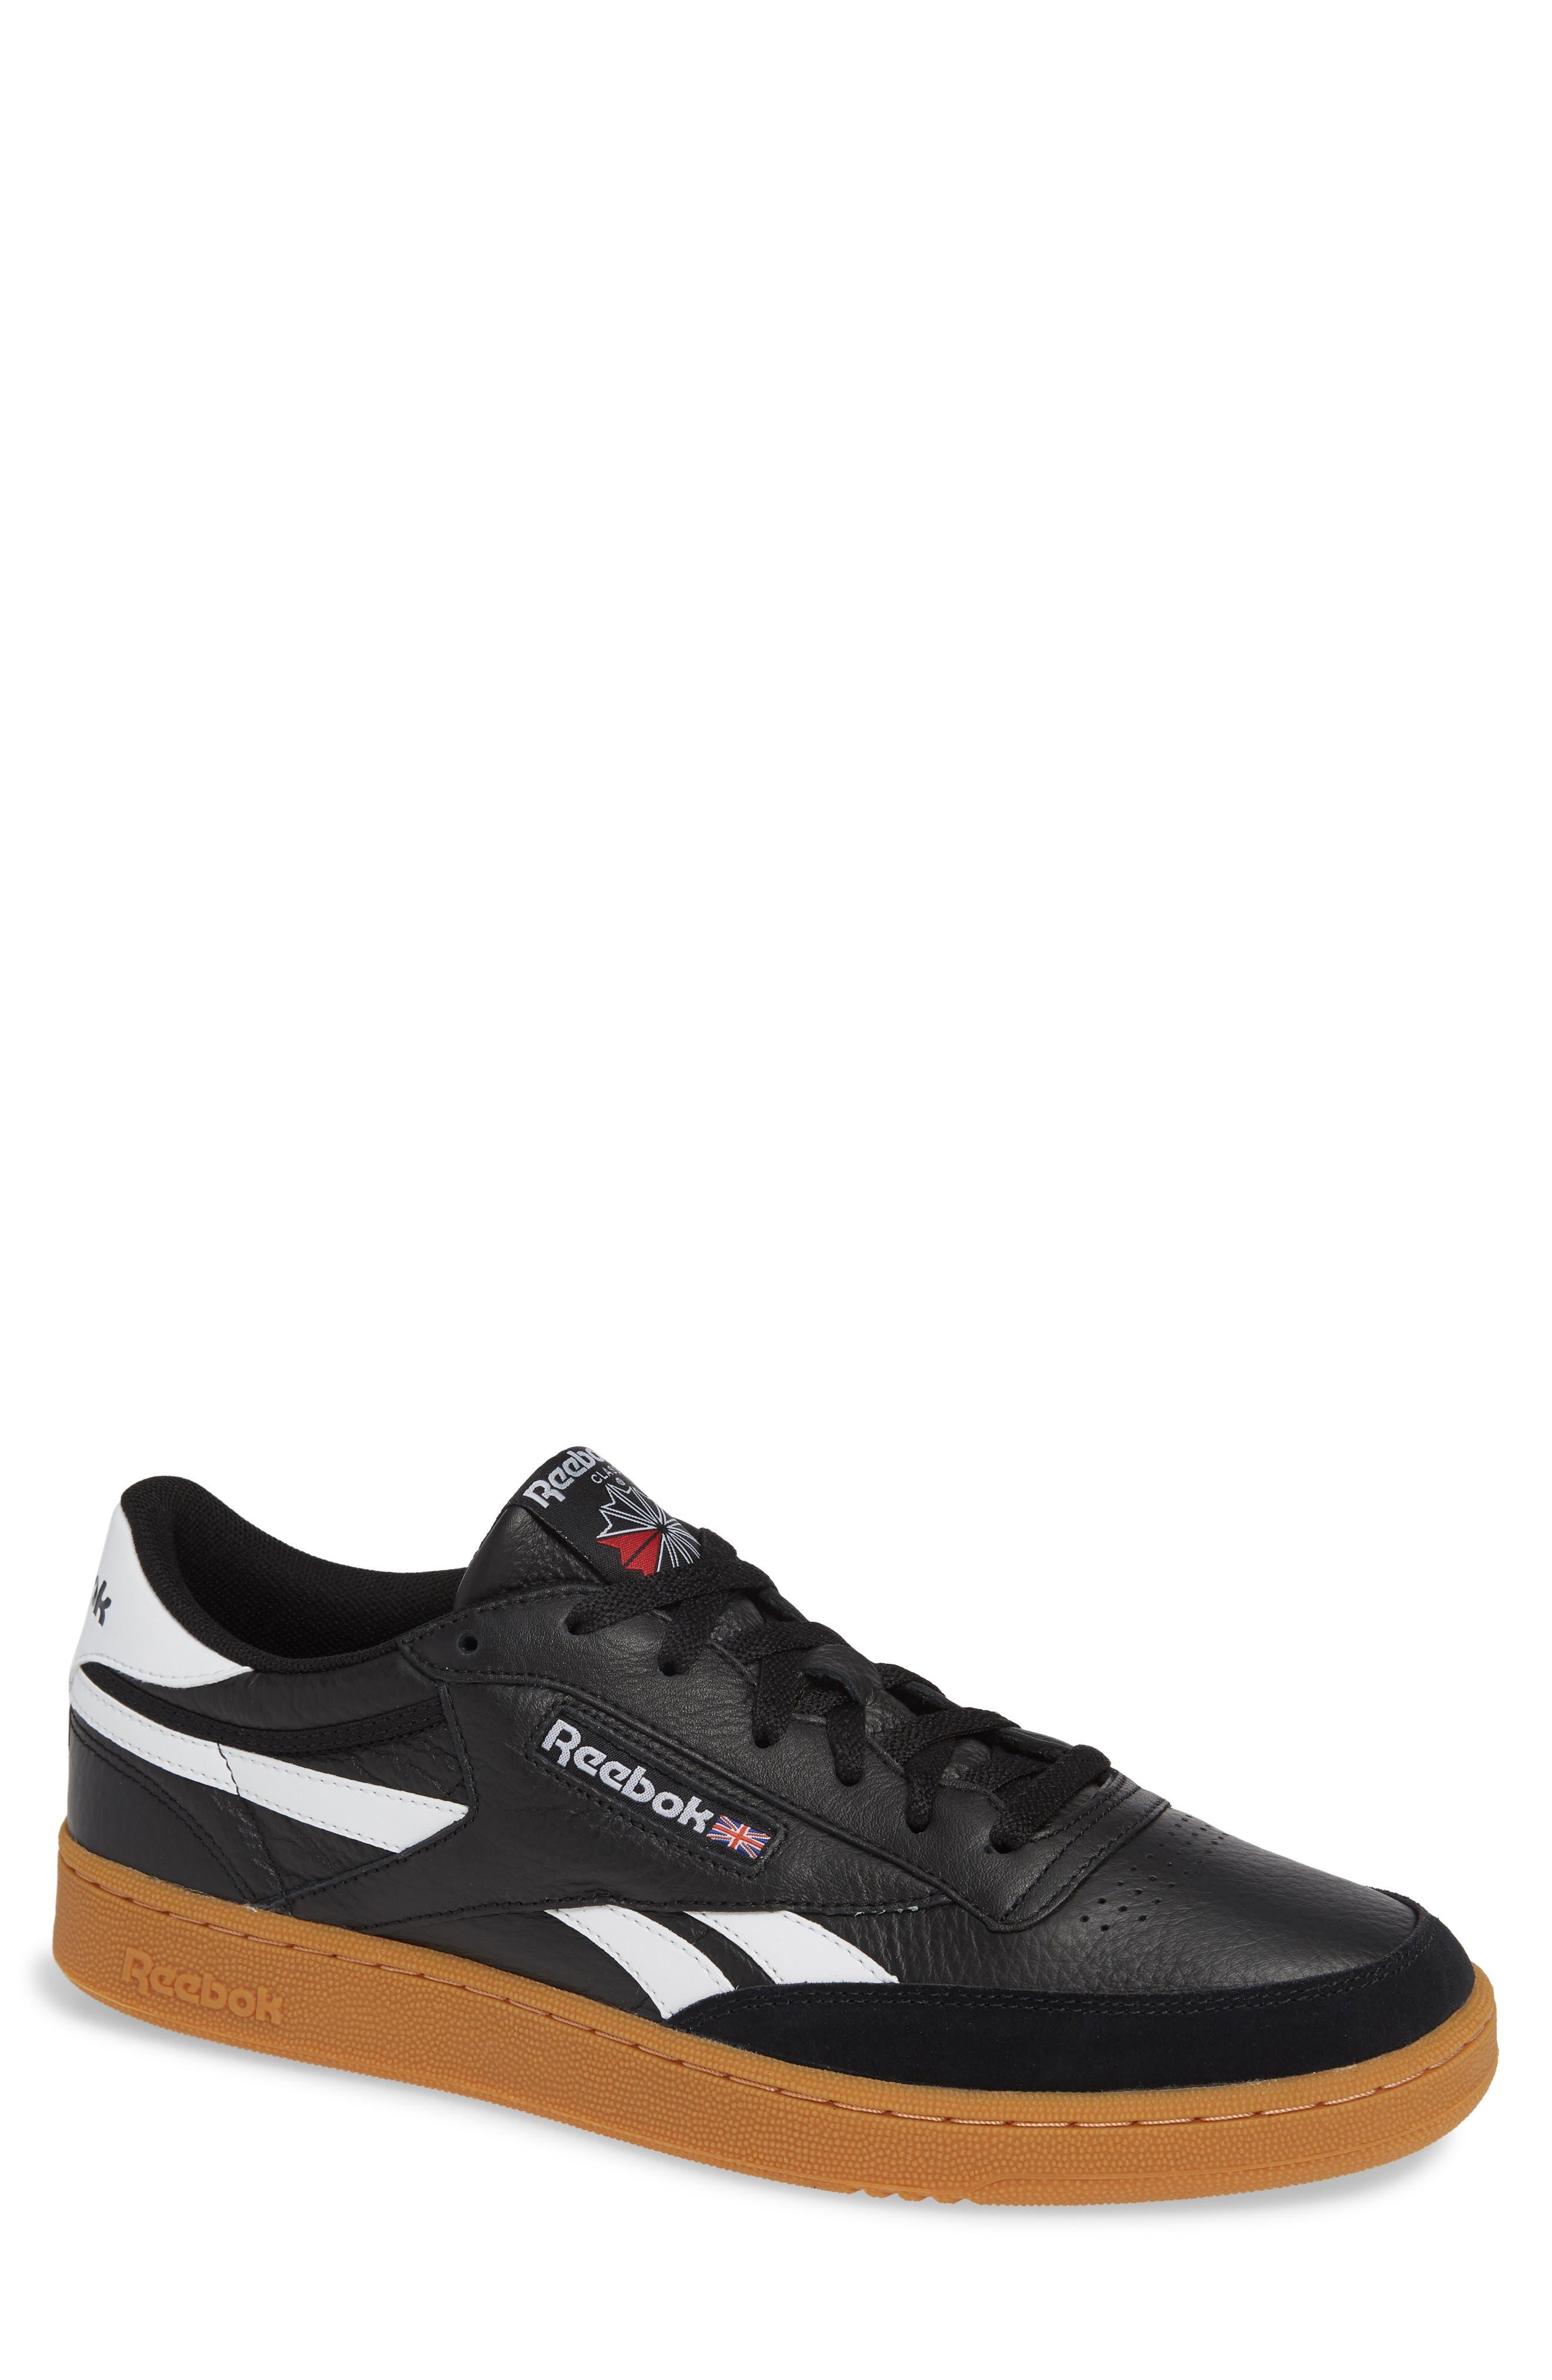 Revenge Plus Sneaker,                             Main thumbnail 1, color,                             BLACK/ WHITE/ GUM